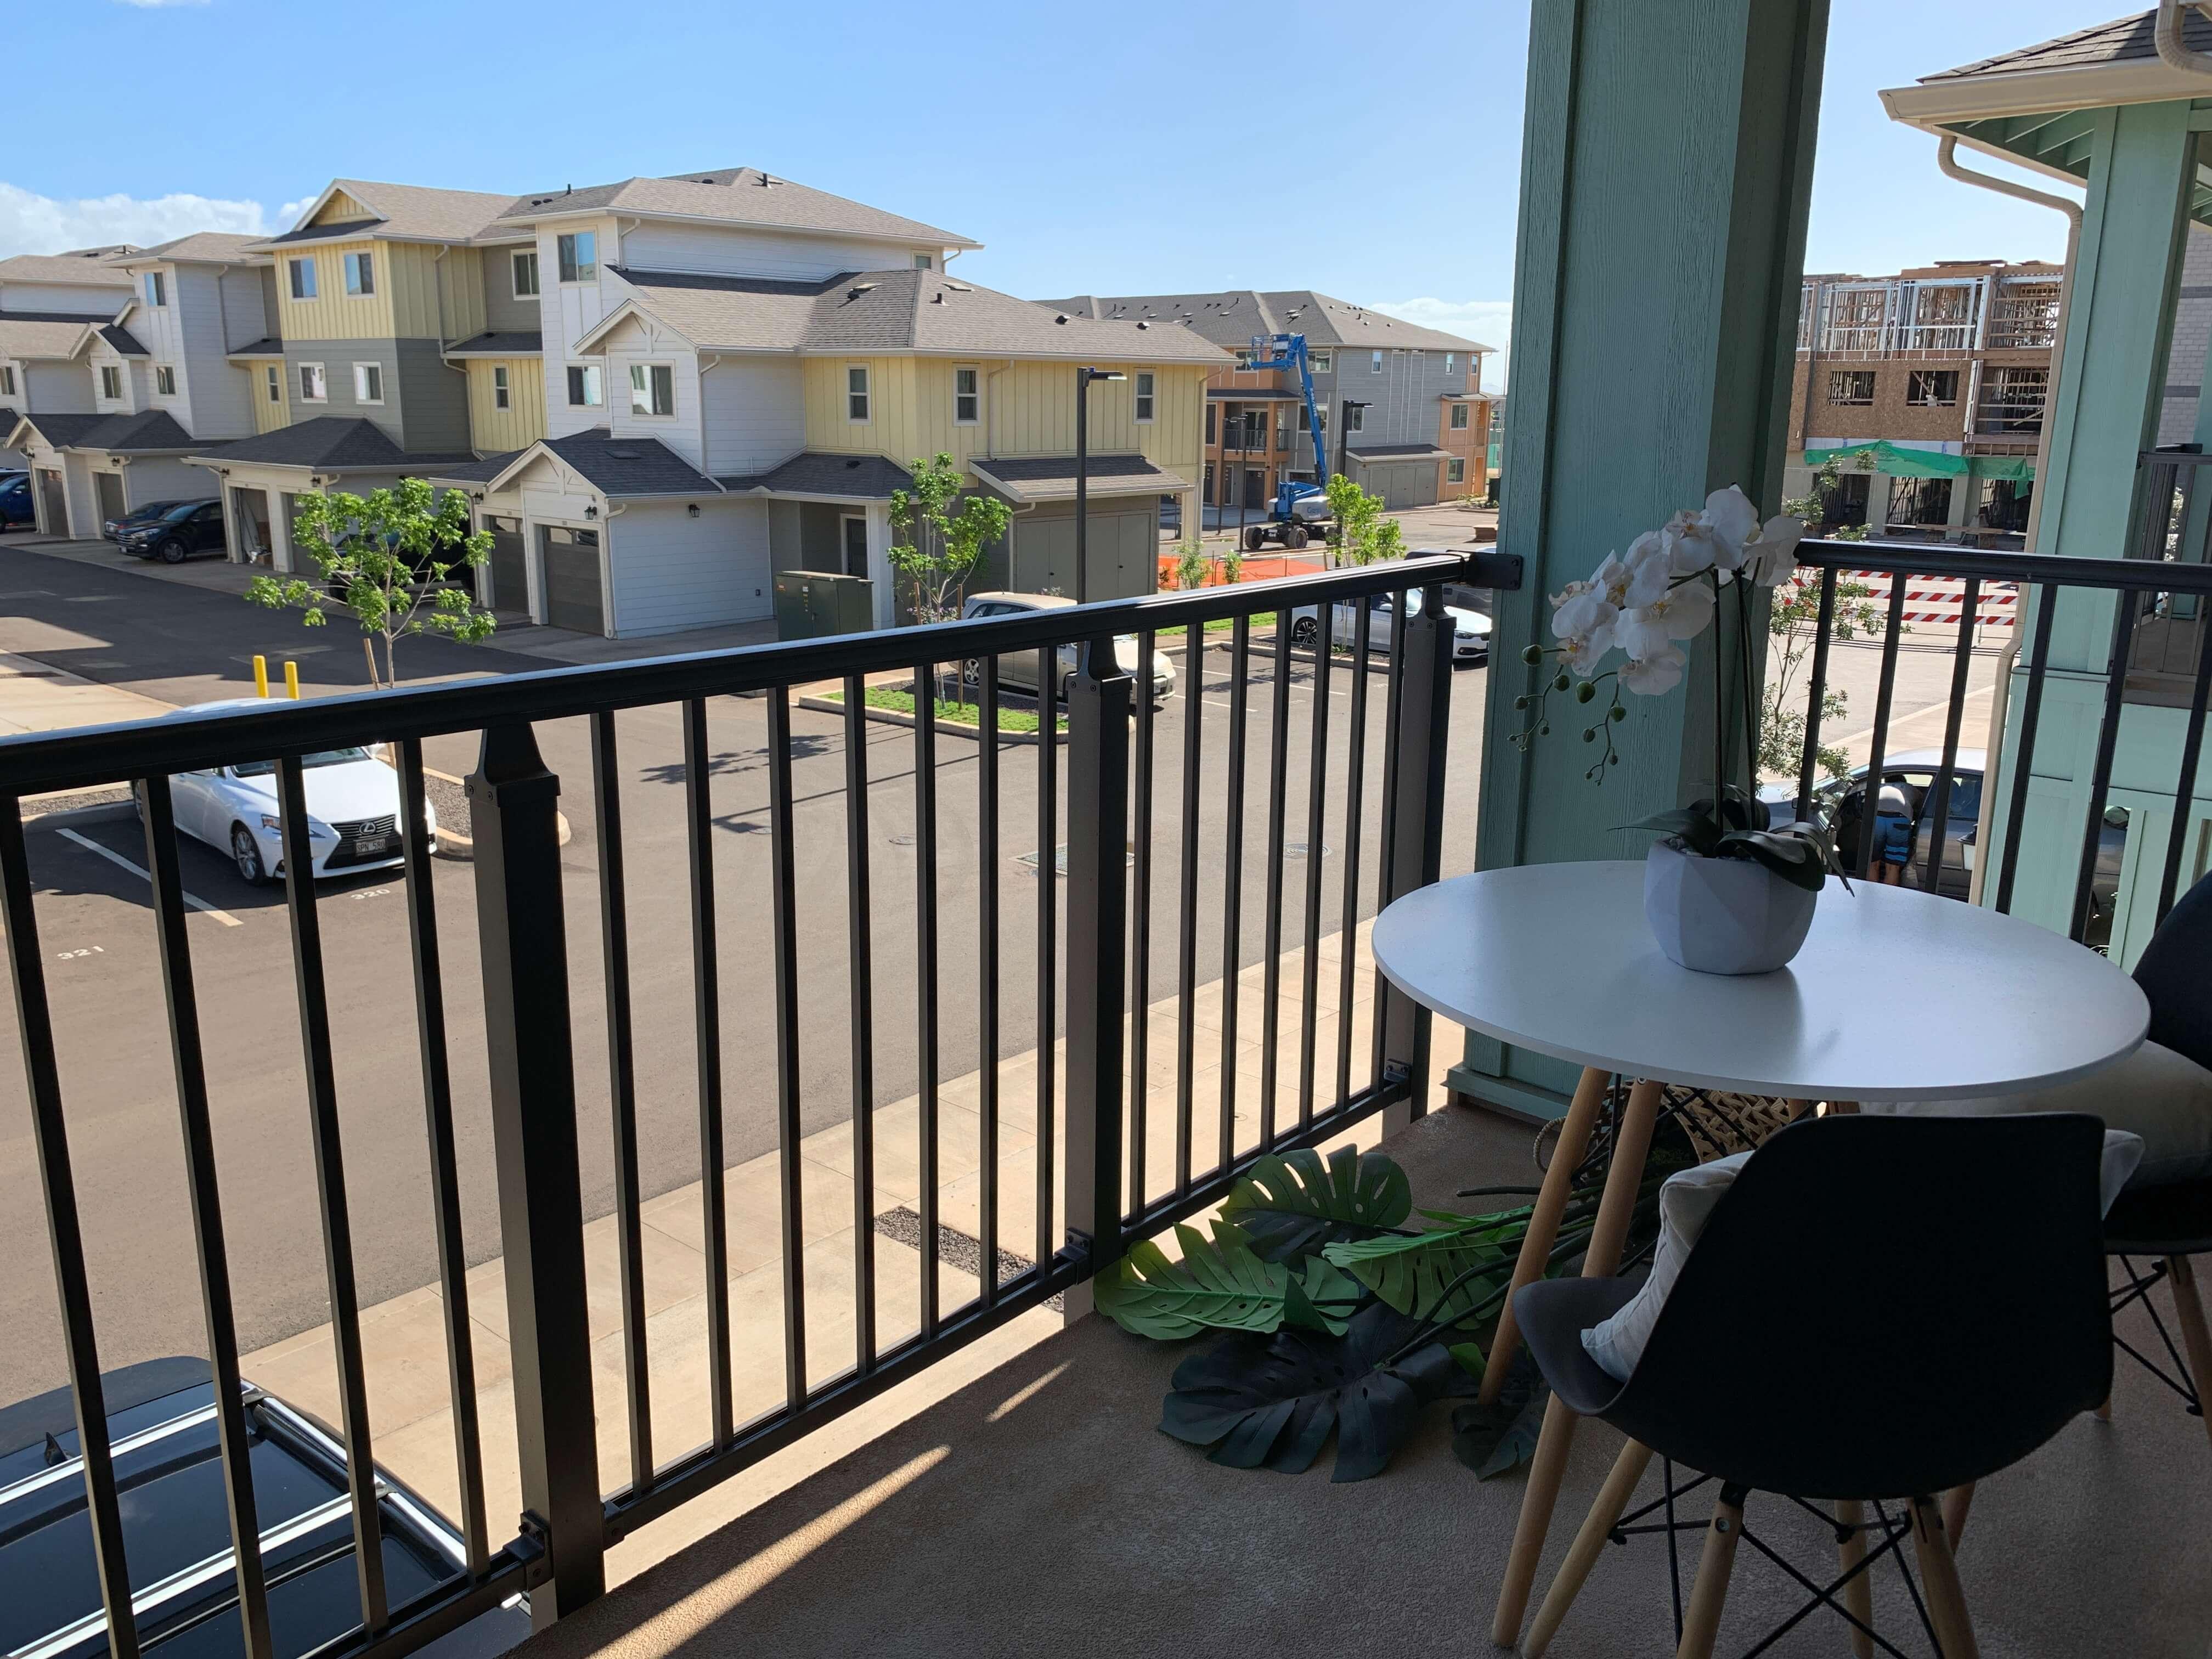 kohina at ho'opili lanai and balcony